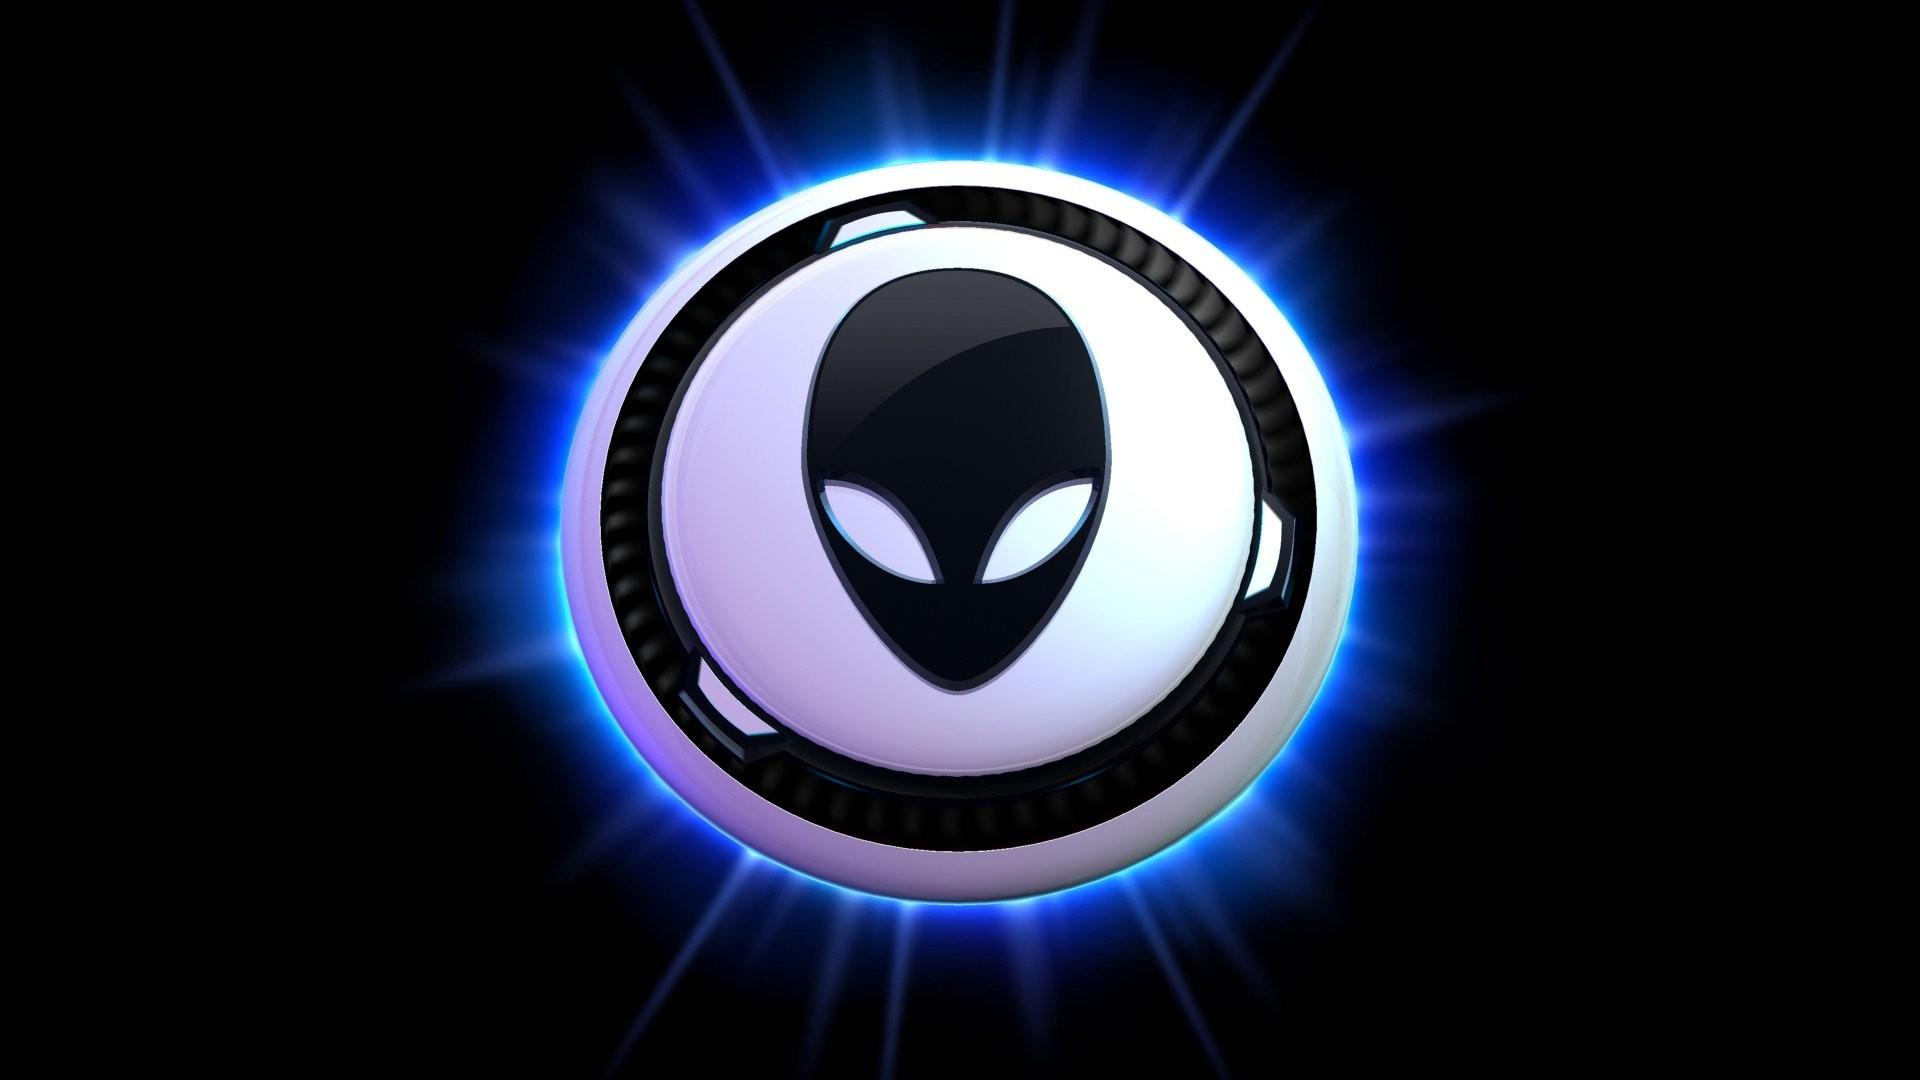 Alienware Wallpaper » WallDevil – Best free HD desktop and mobile .